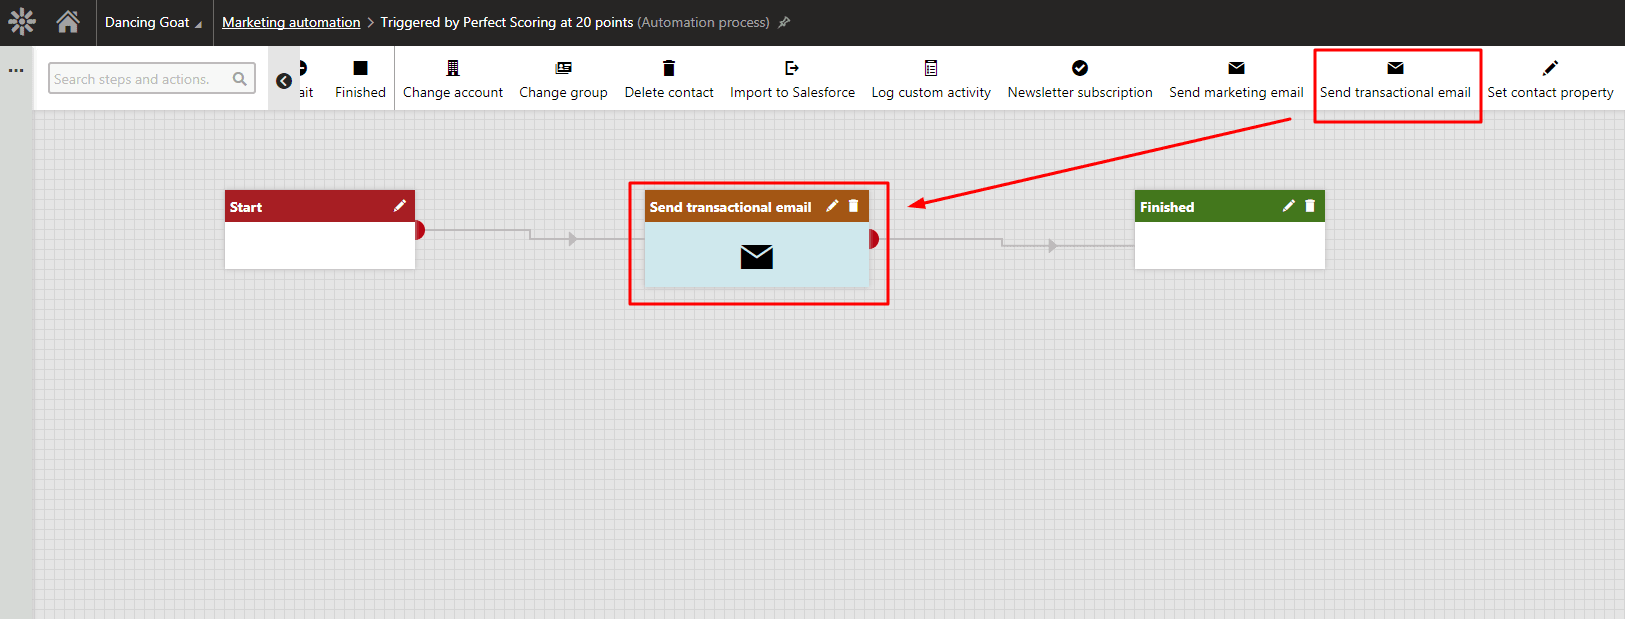 Marketin Automation Workflow